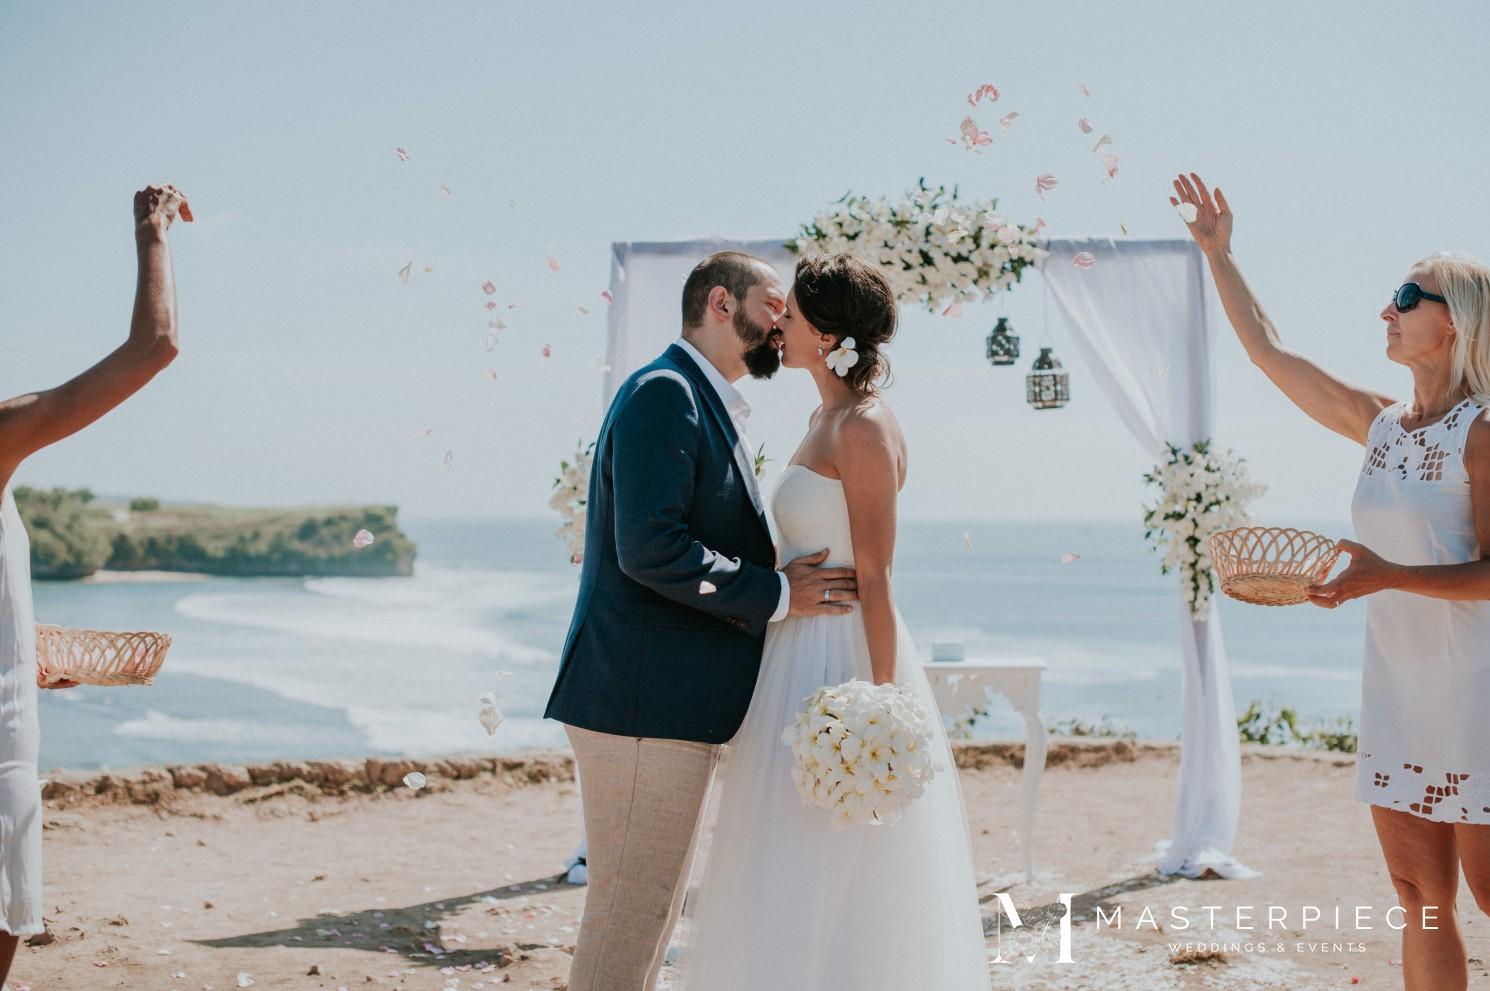 Masterpiece_Weddings_sluby_029